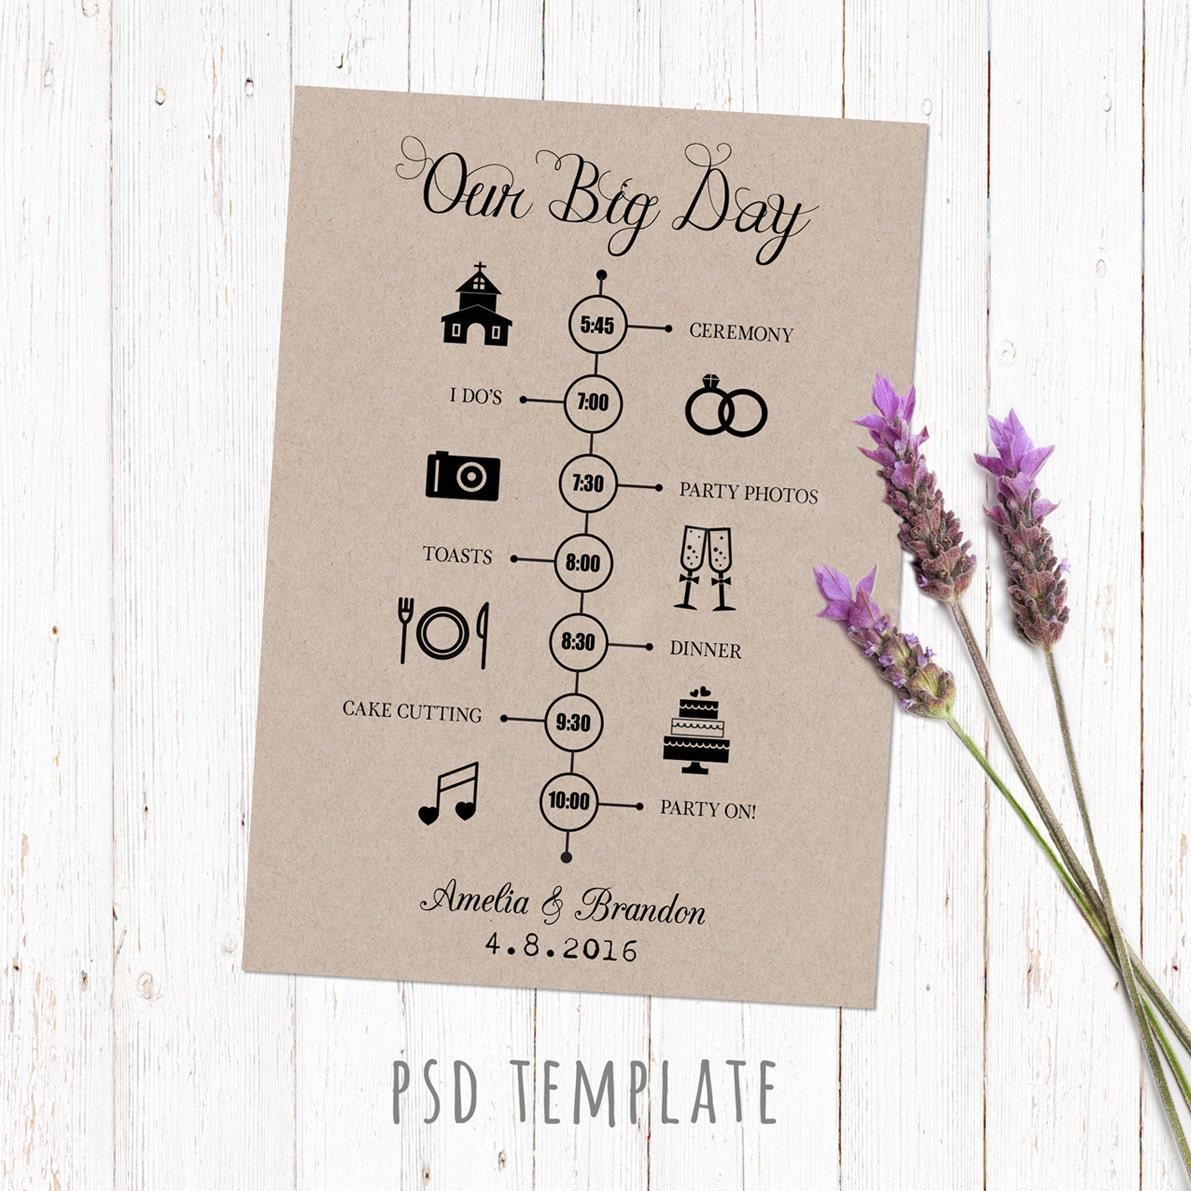 wedding timeline template free - wedding timeline template card digital printable timeline